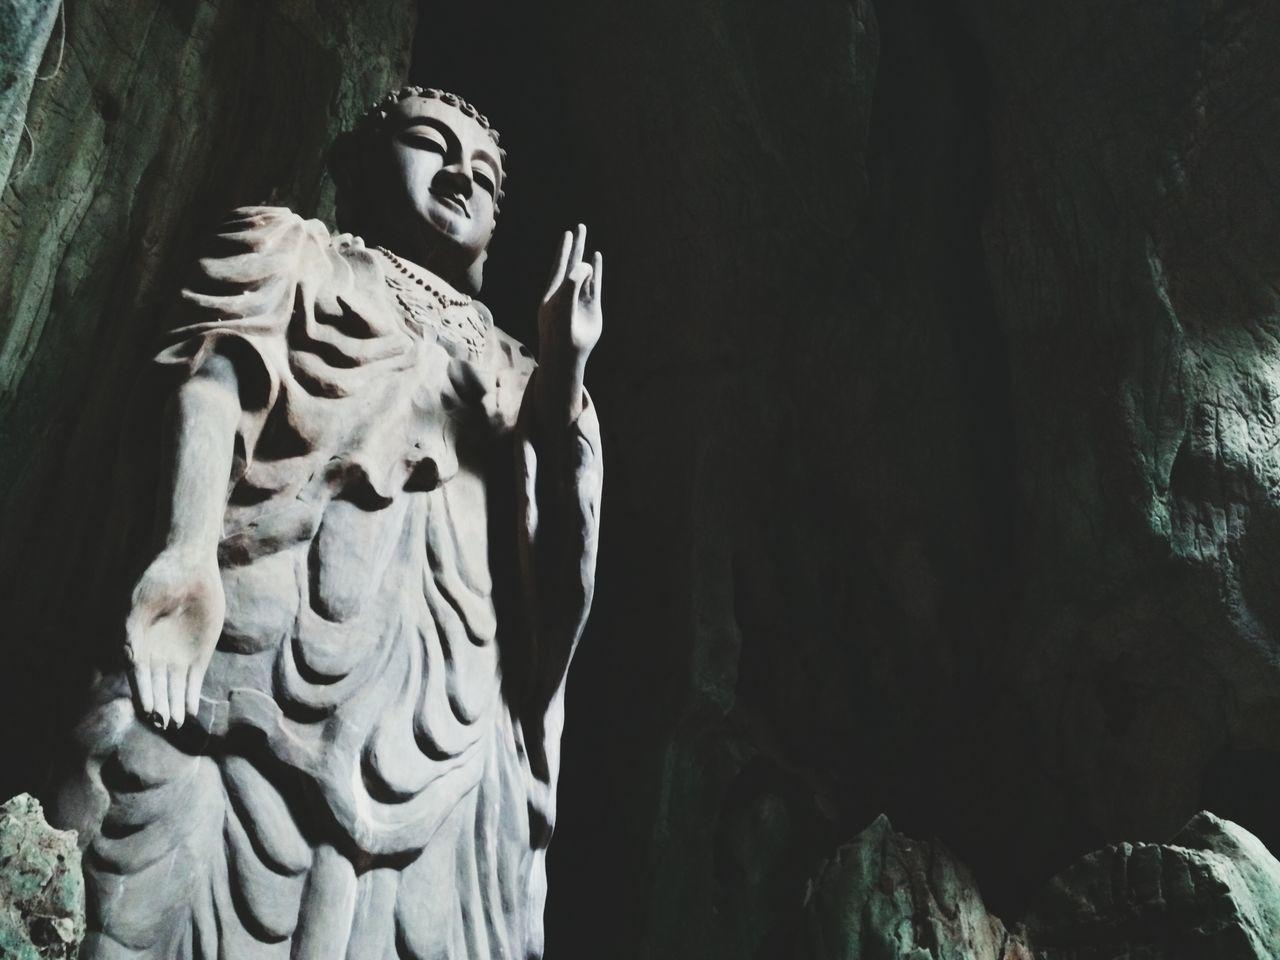 Tịnh 🙍 Travel Danang Vietnam Buddha Statue Cave Shade Lights Nguhanhson Pagoda Culture